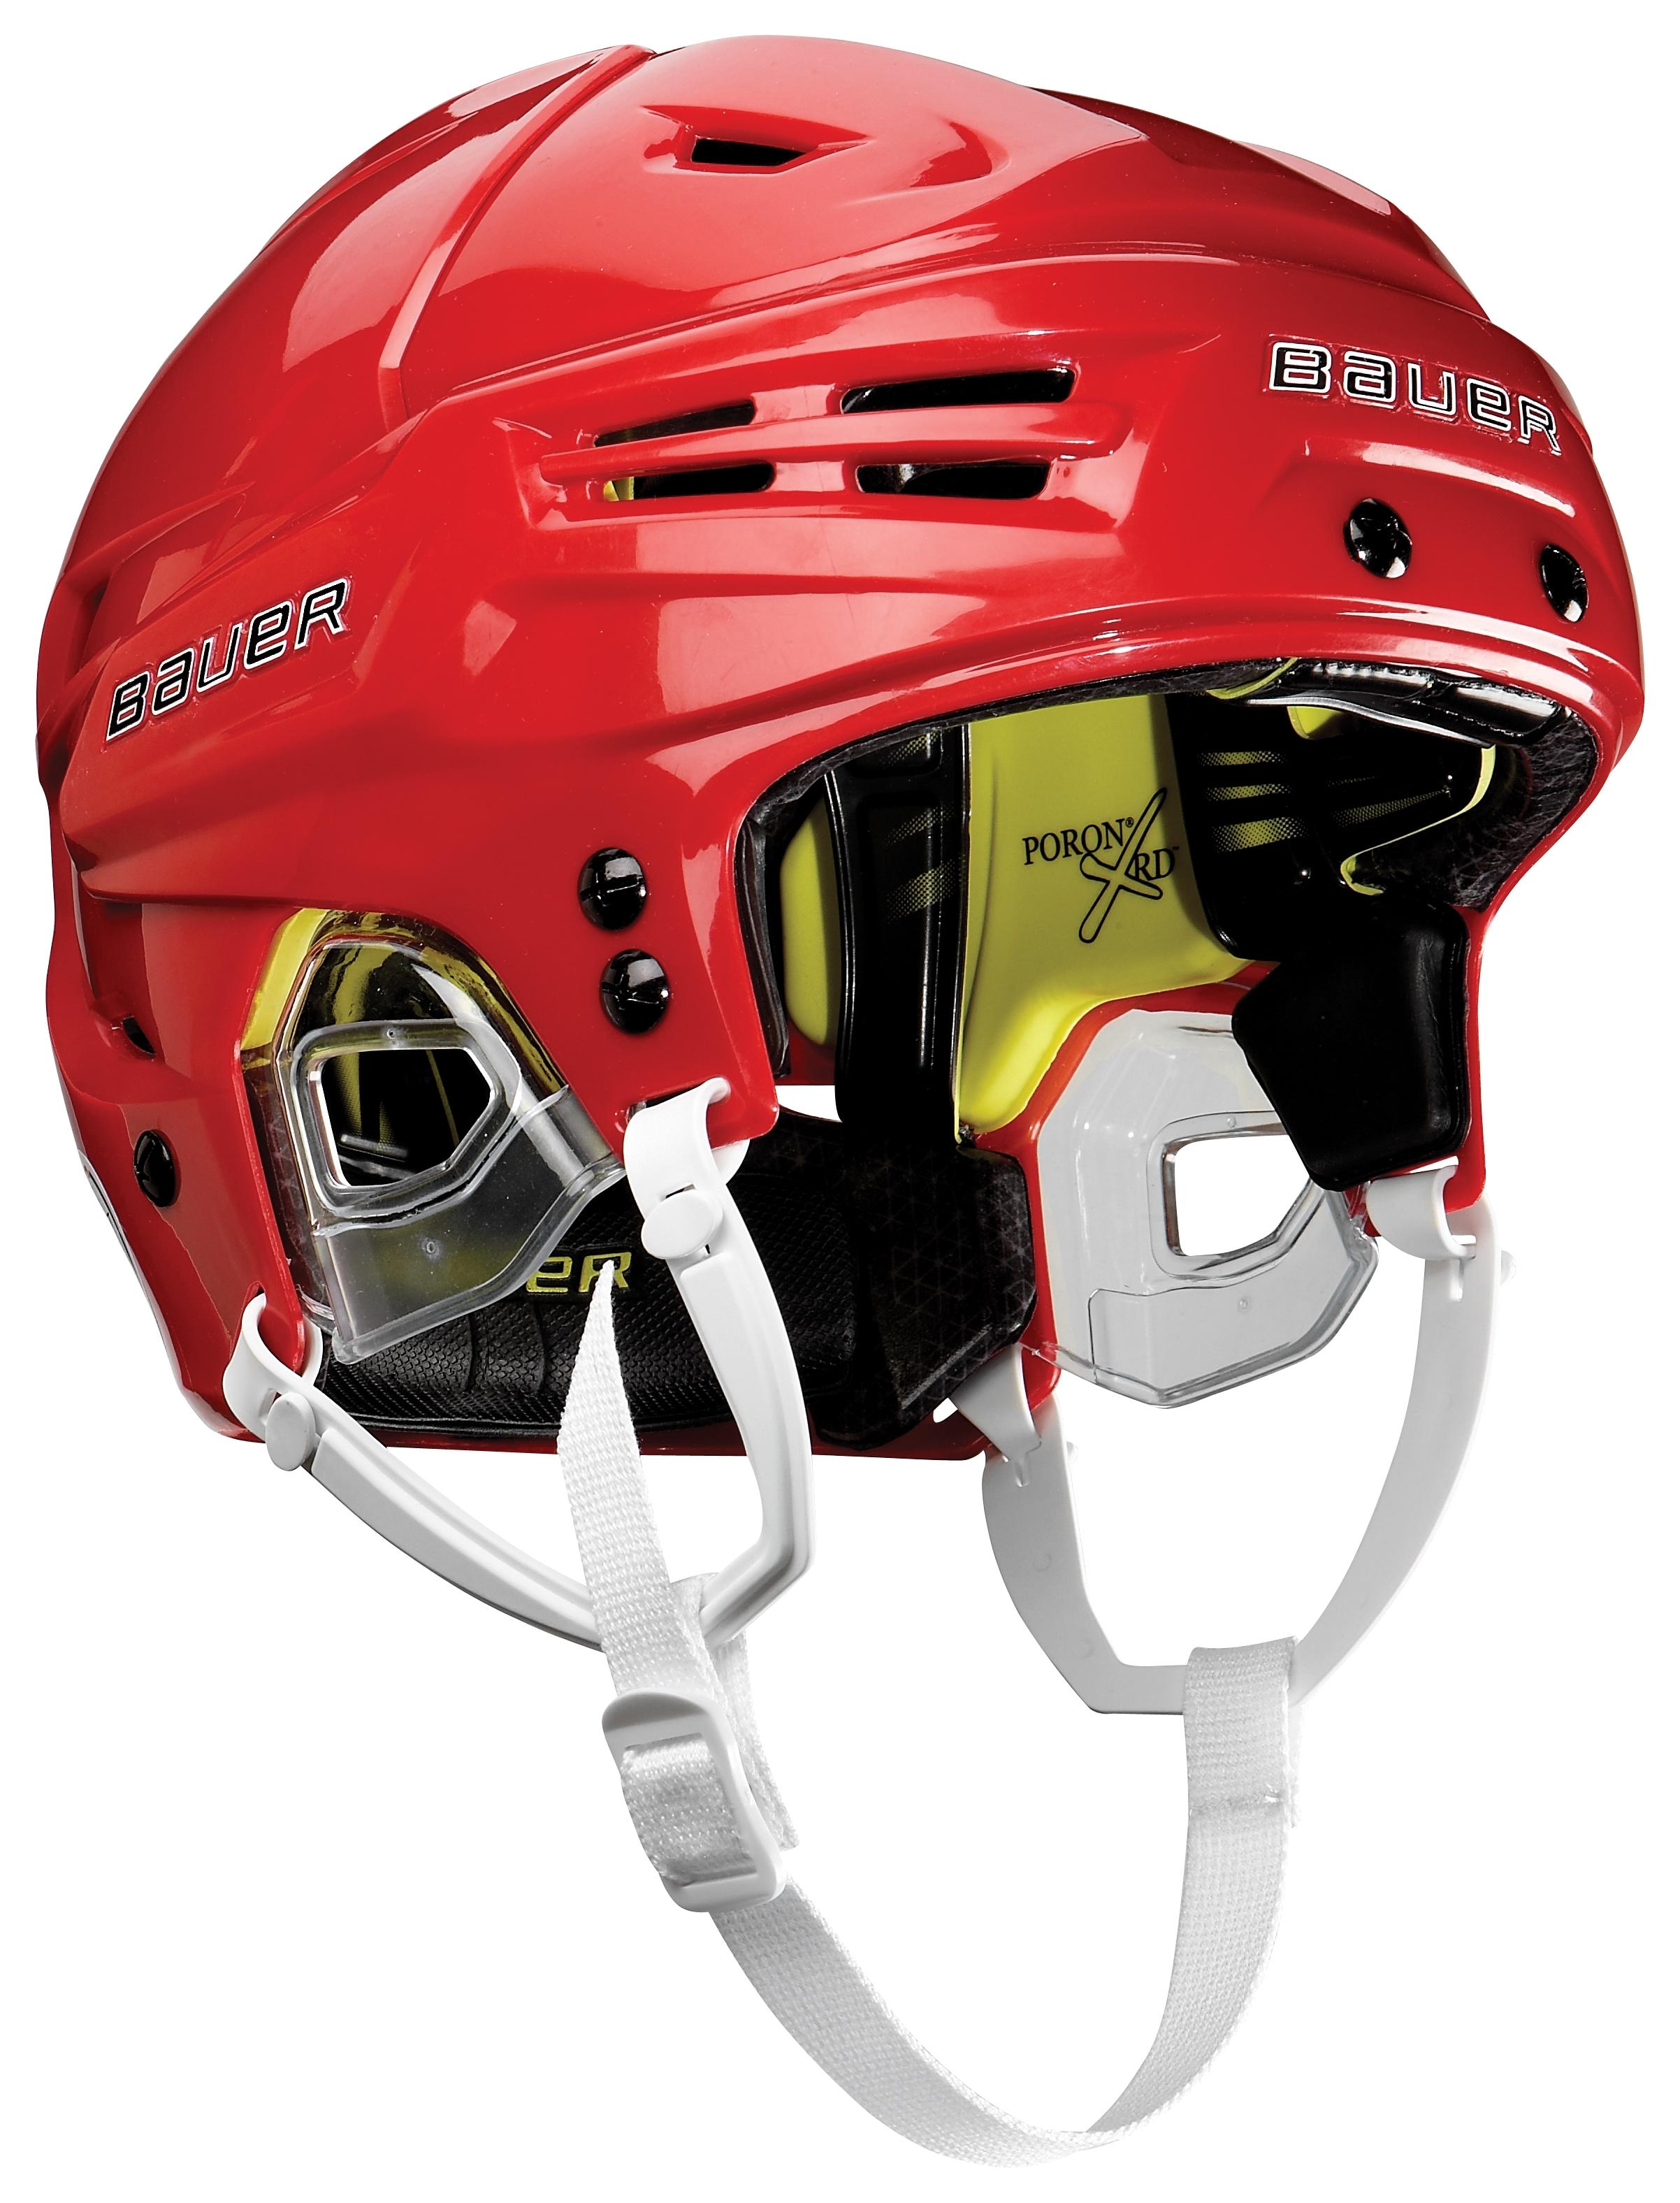 Bauer ReAkt 200 Helmet Review  The Hockey Shop Source